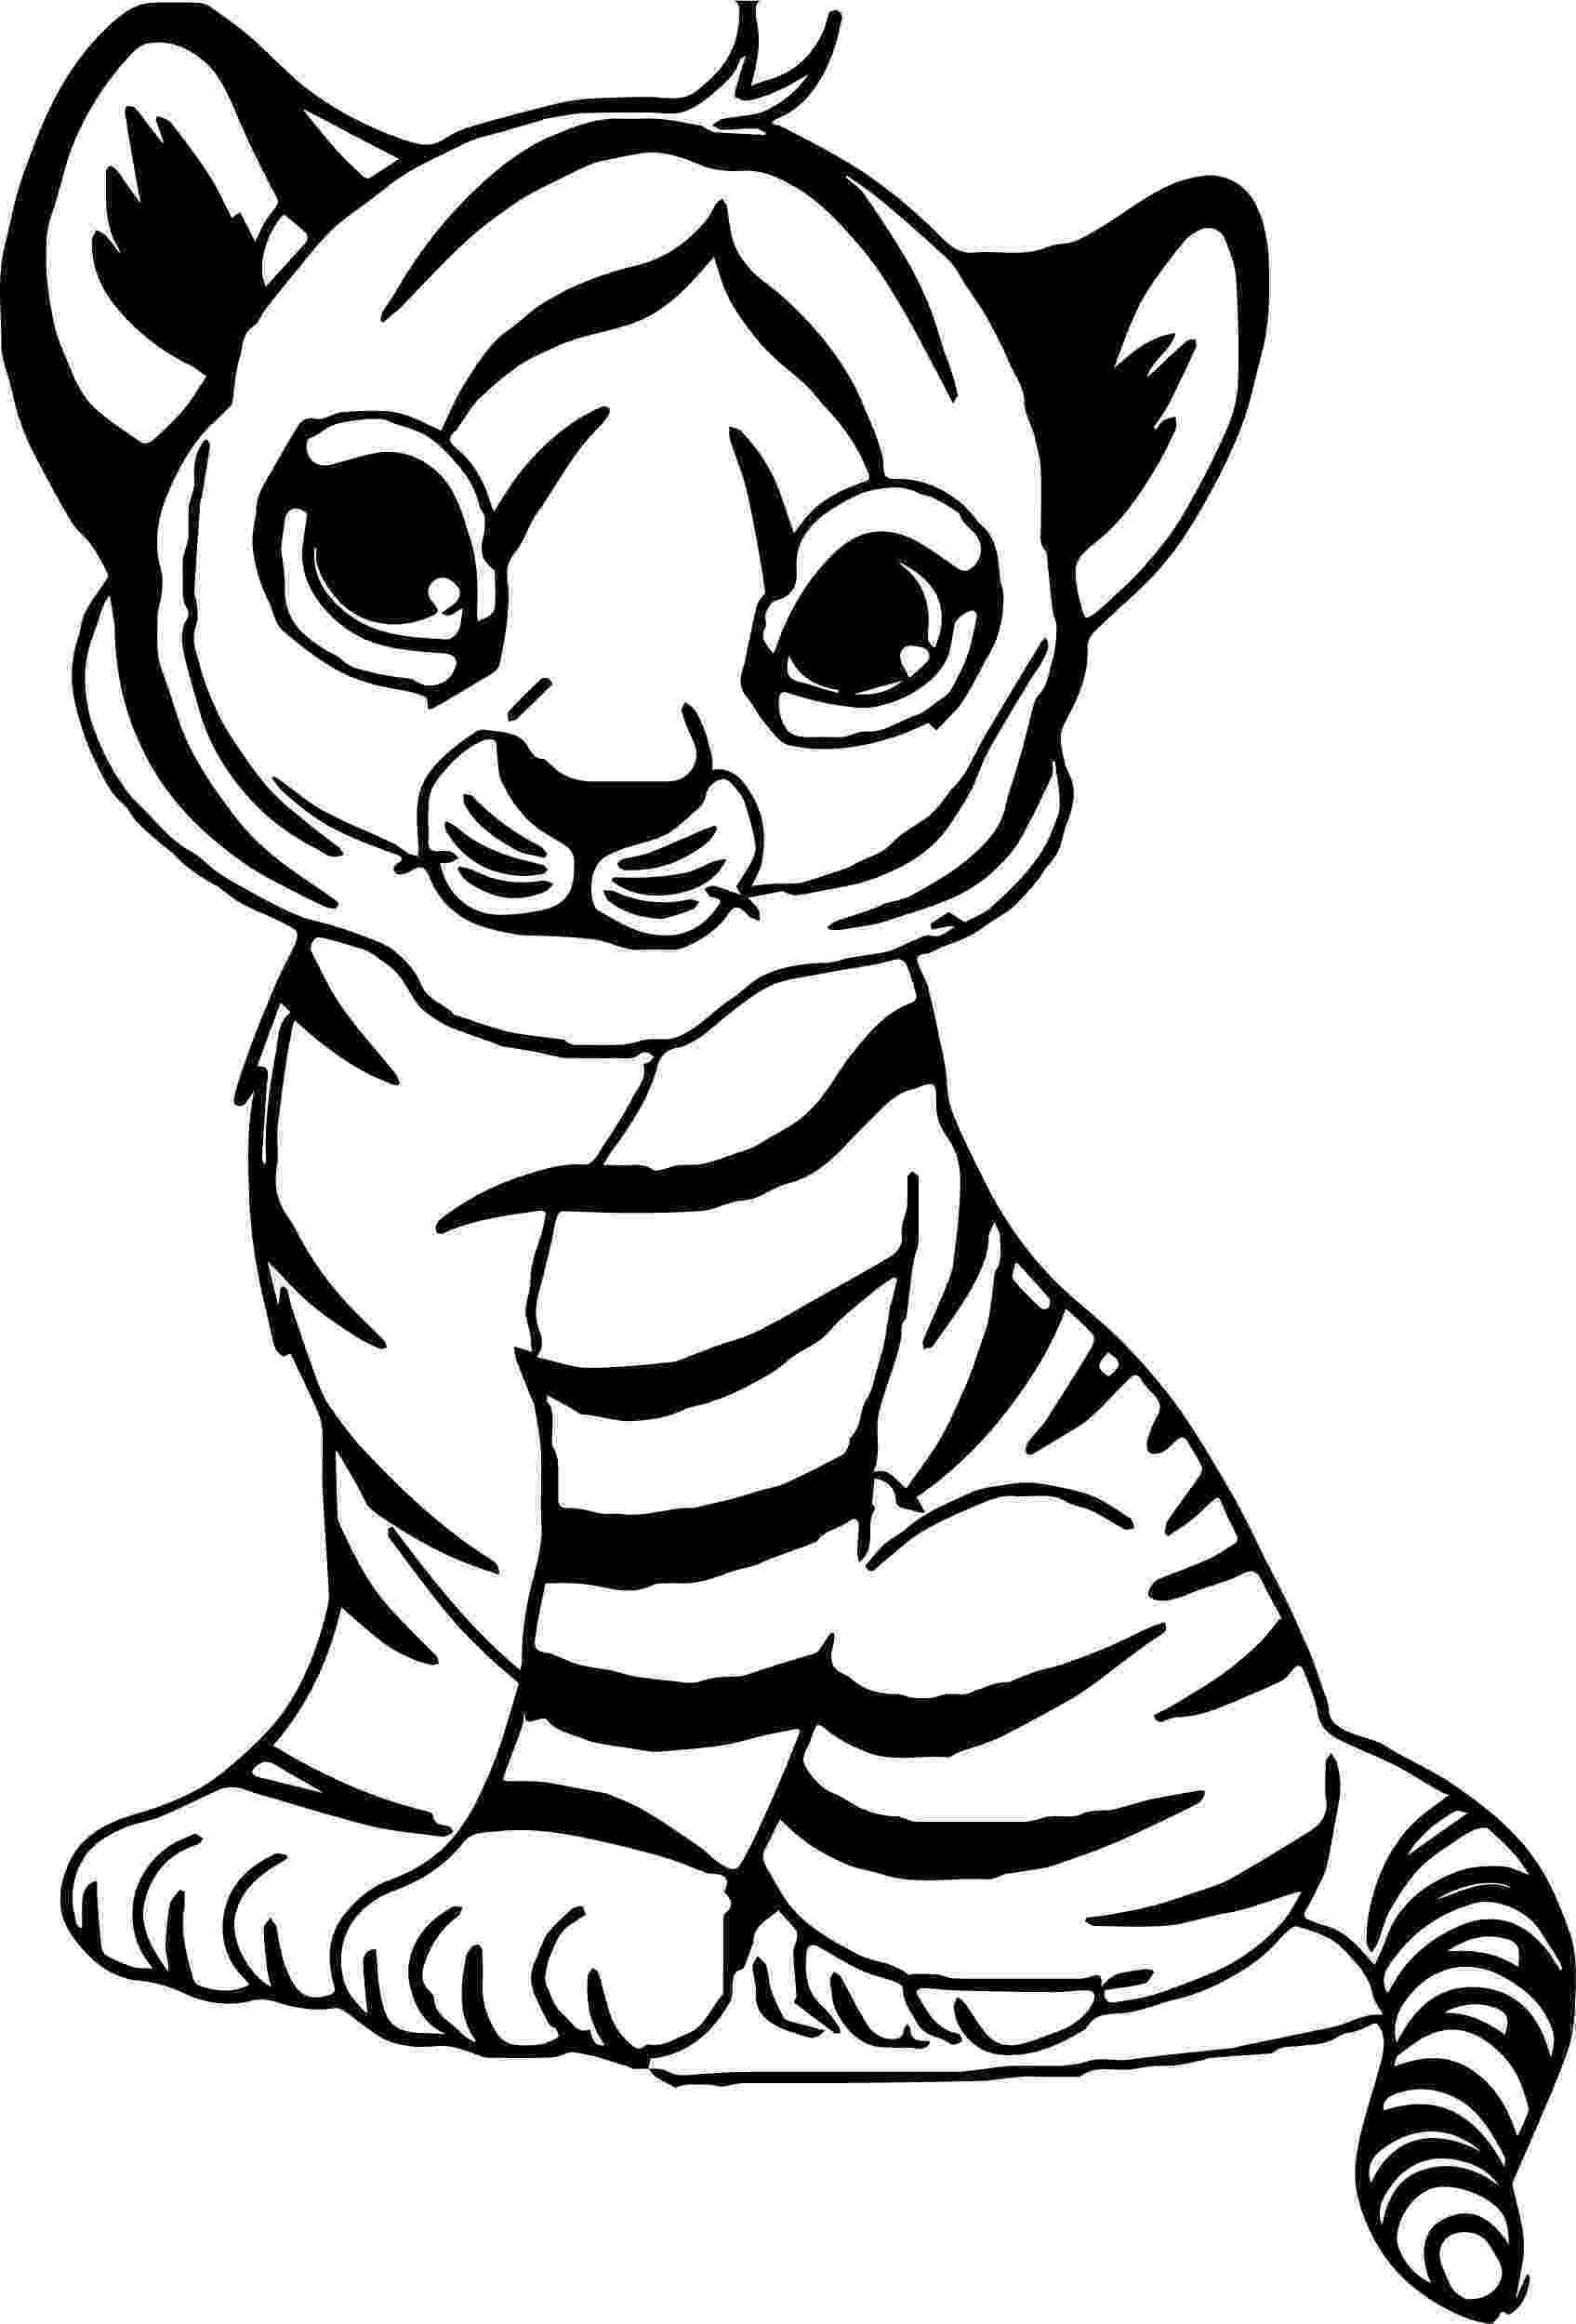 coloring page tiger free printable tiger coloring pages for kids page tiger coloring 1 3